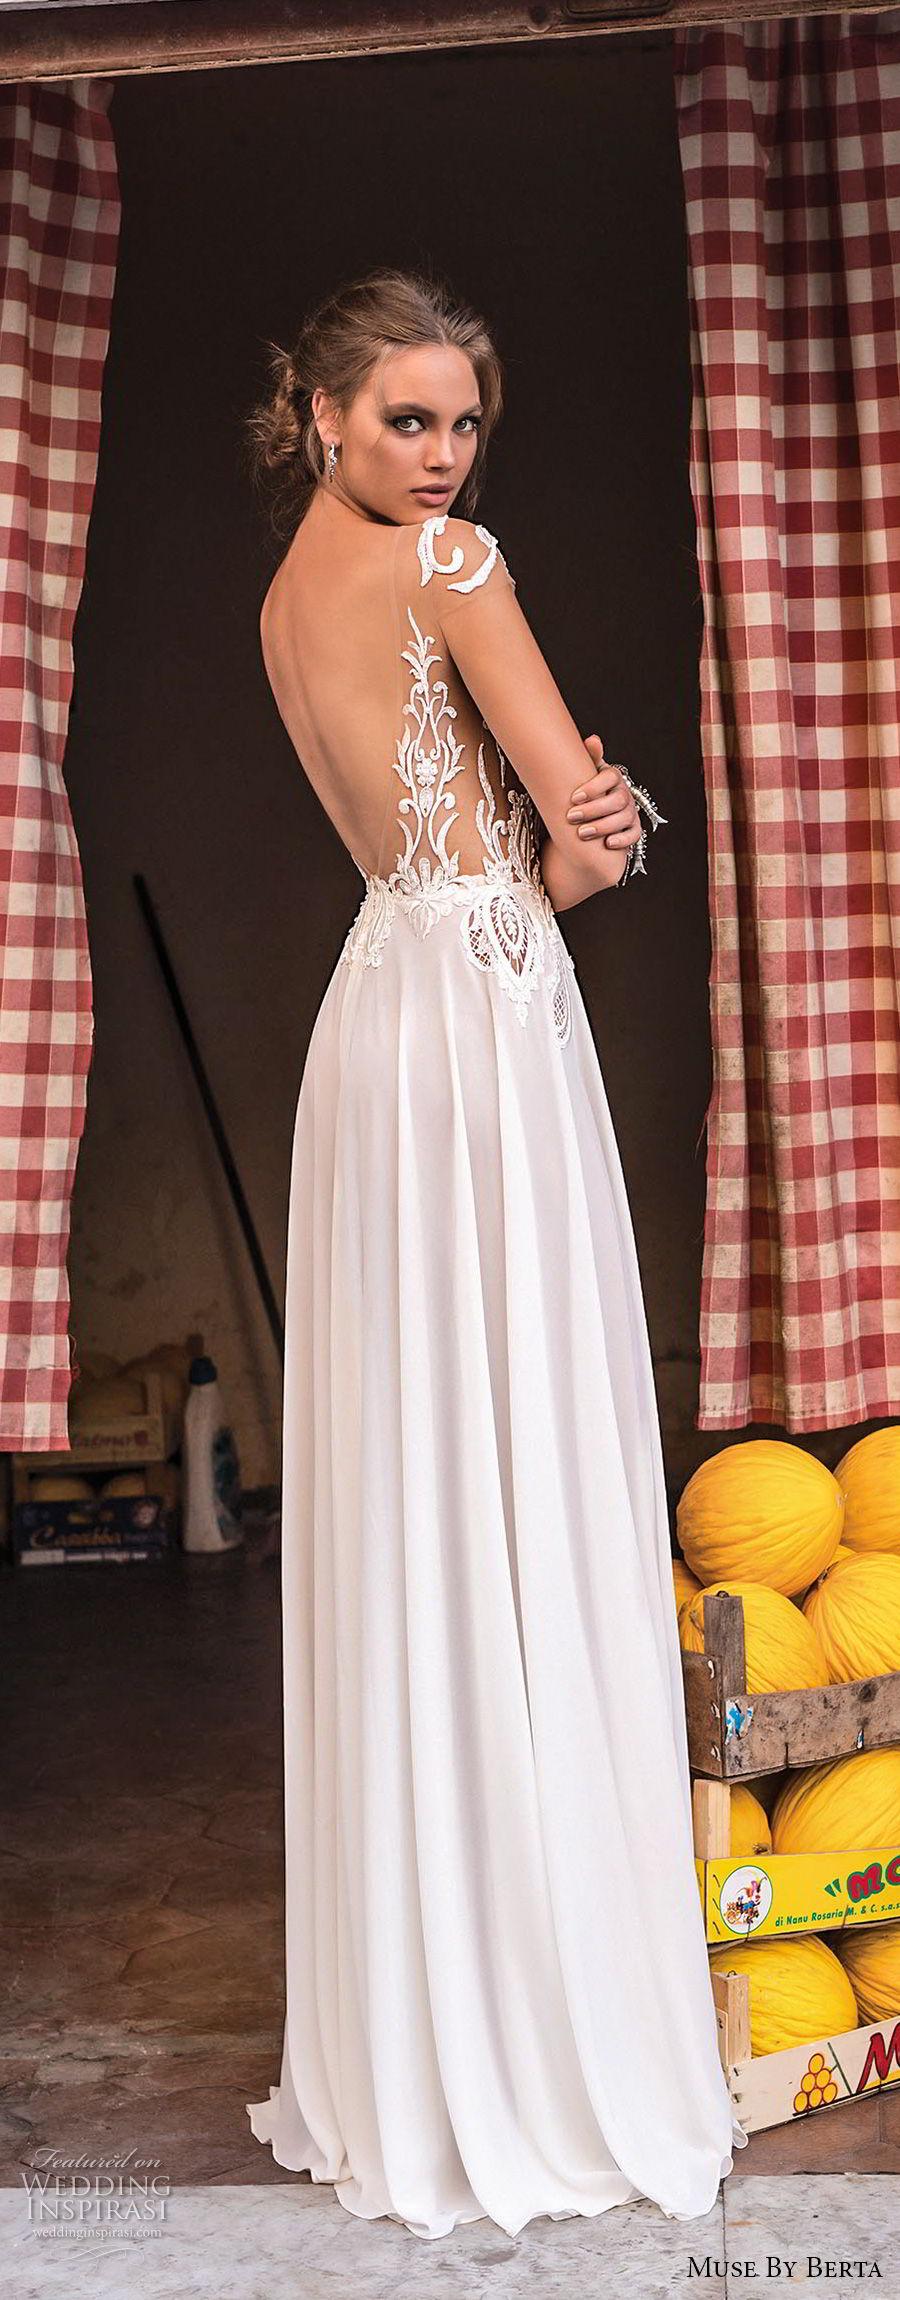 muse-berta-2018-bridal-cap-sleeves-v-neckline-heavily-embellished-bodice-high-slit-skirt-sexy-romantic-soft-a-line-wedding-dress-open-v-back-sweep-train-3-bv